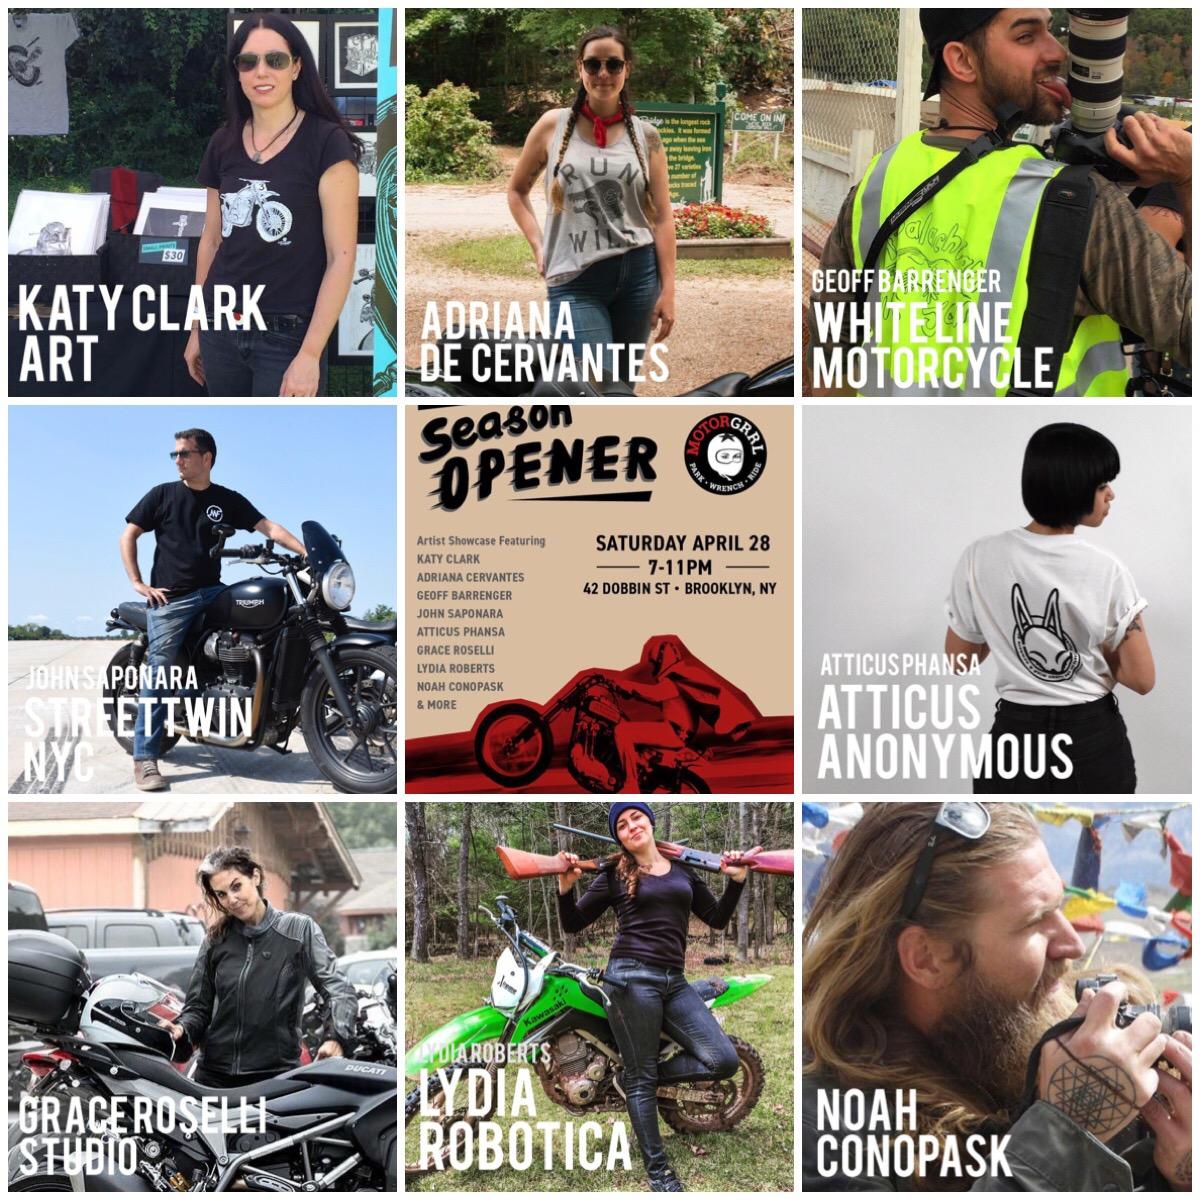 The artists featured at Motorgrrl's Season Opener art show: Katy Clark, Adriana De Cervantes, Geoff Barrenger, John Saponara, Grace Roselli, Lydia Roberts, Noah Conopask and yours truly.